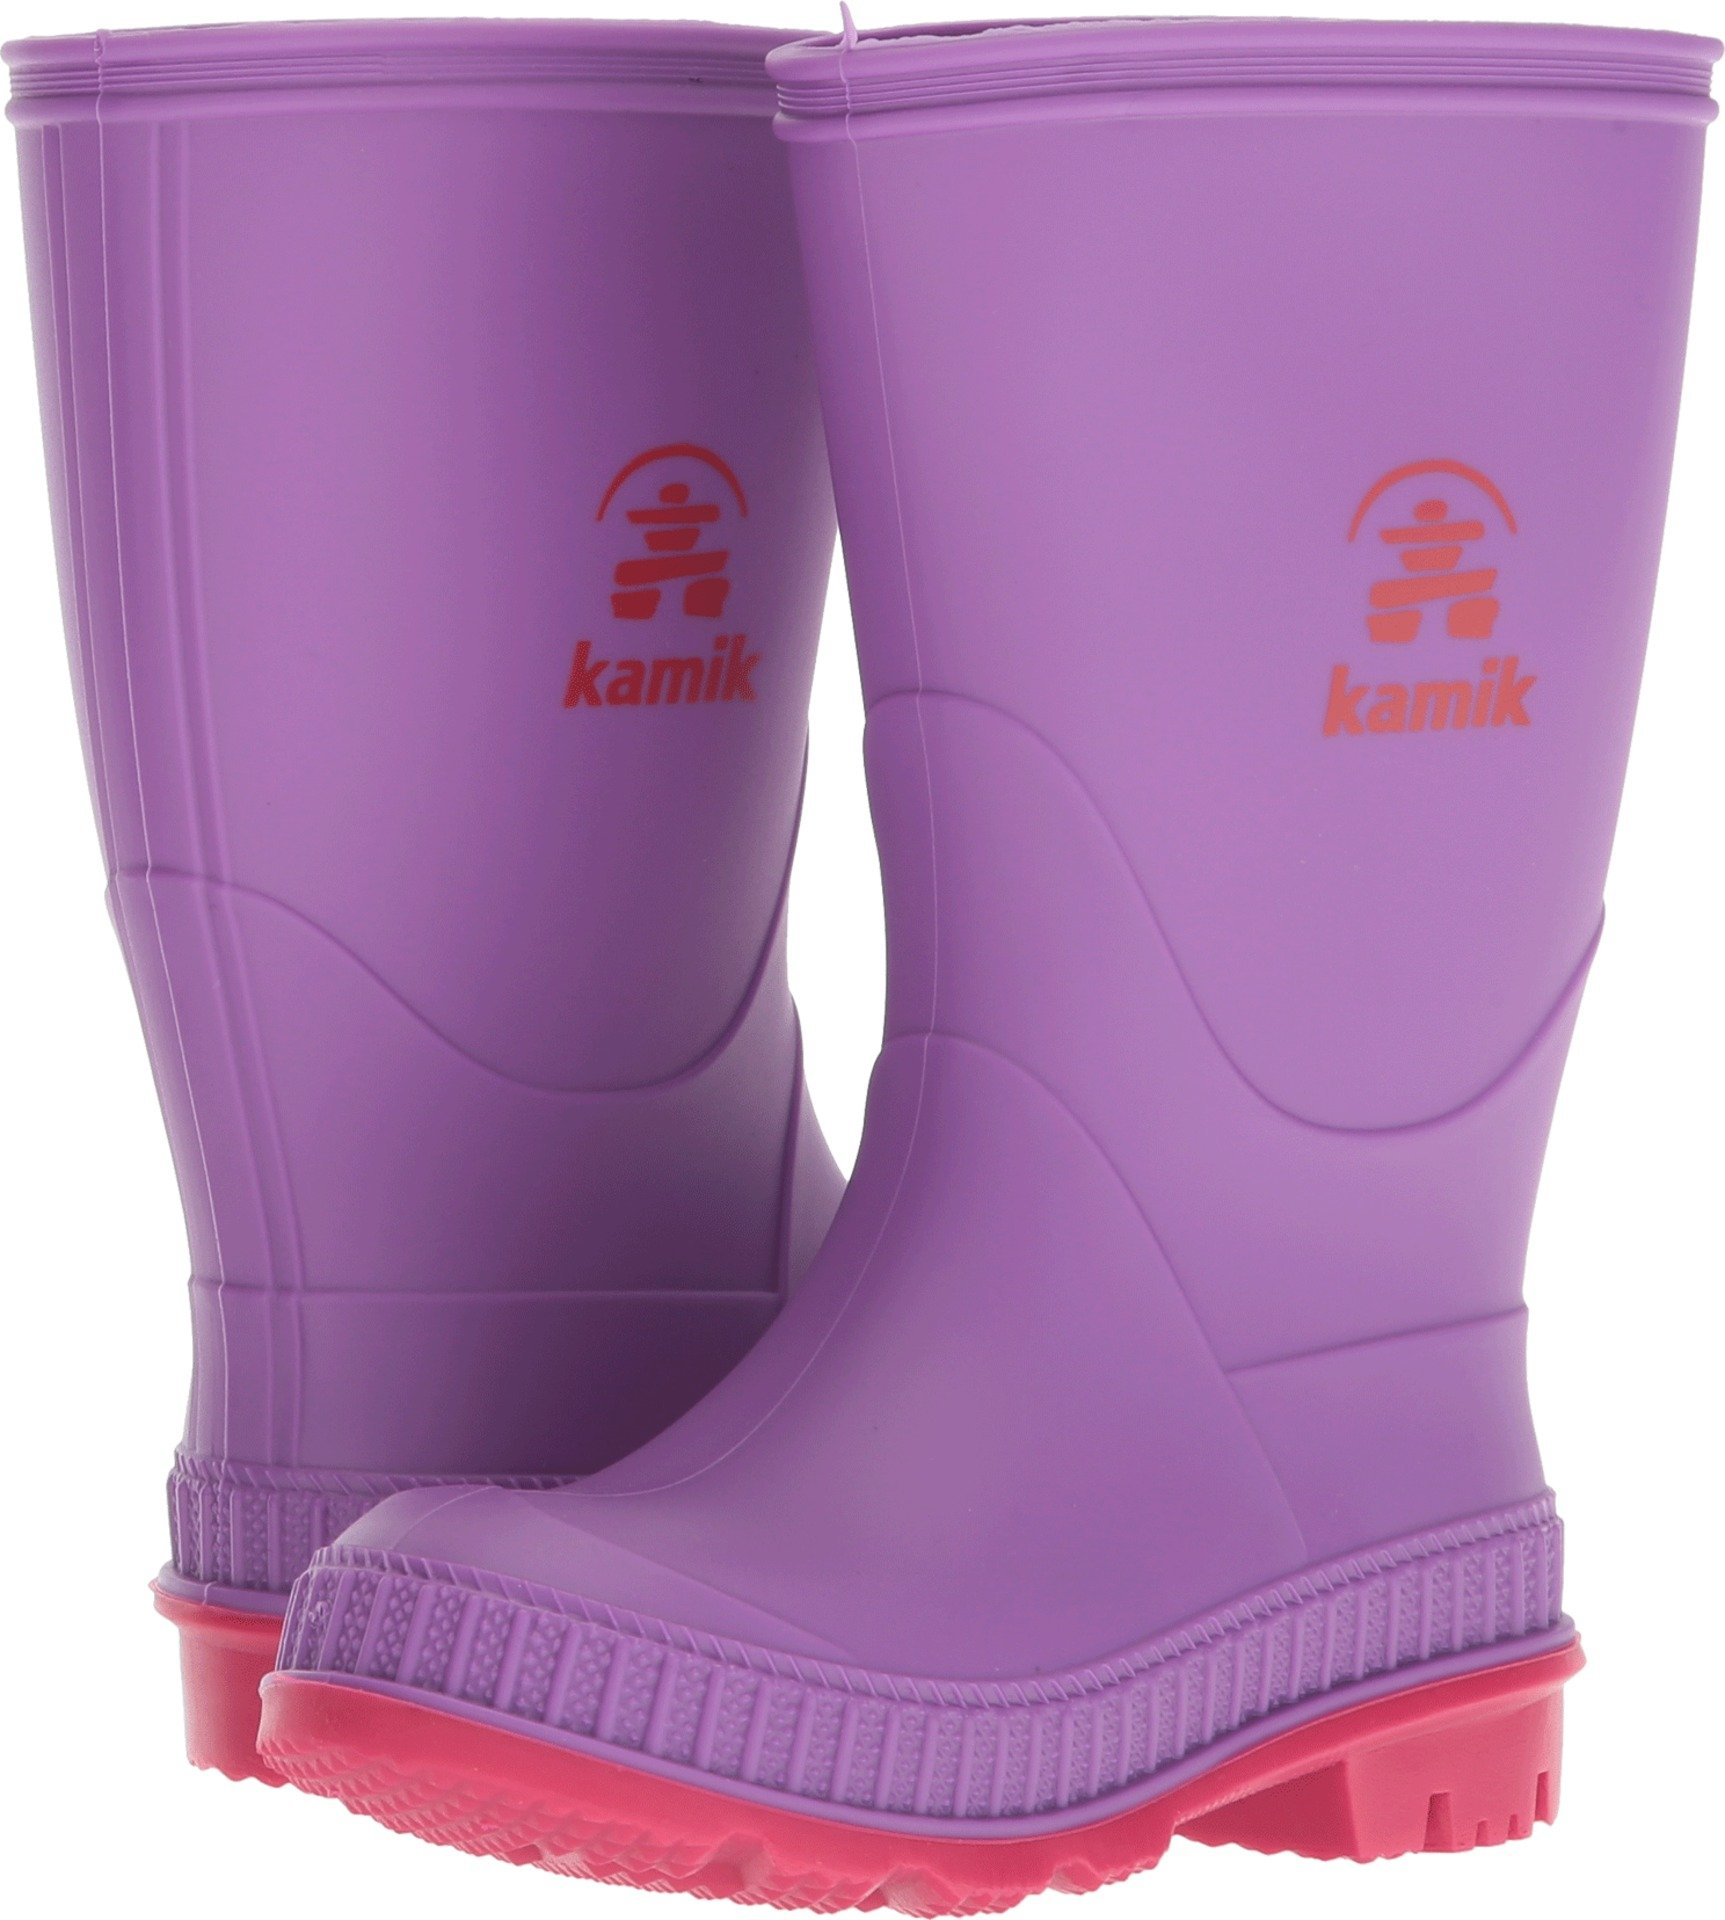 Kamik Girls' Stomp, Purple/Bright Rose, 12 M US Little Kid